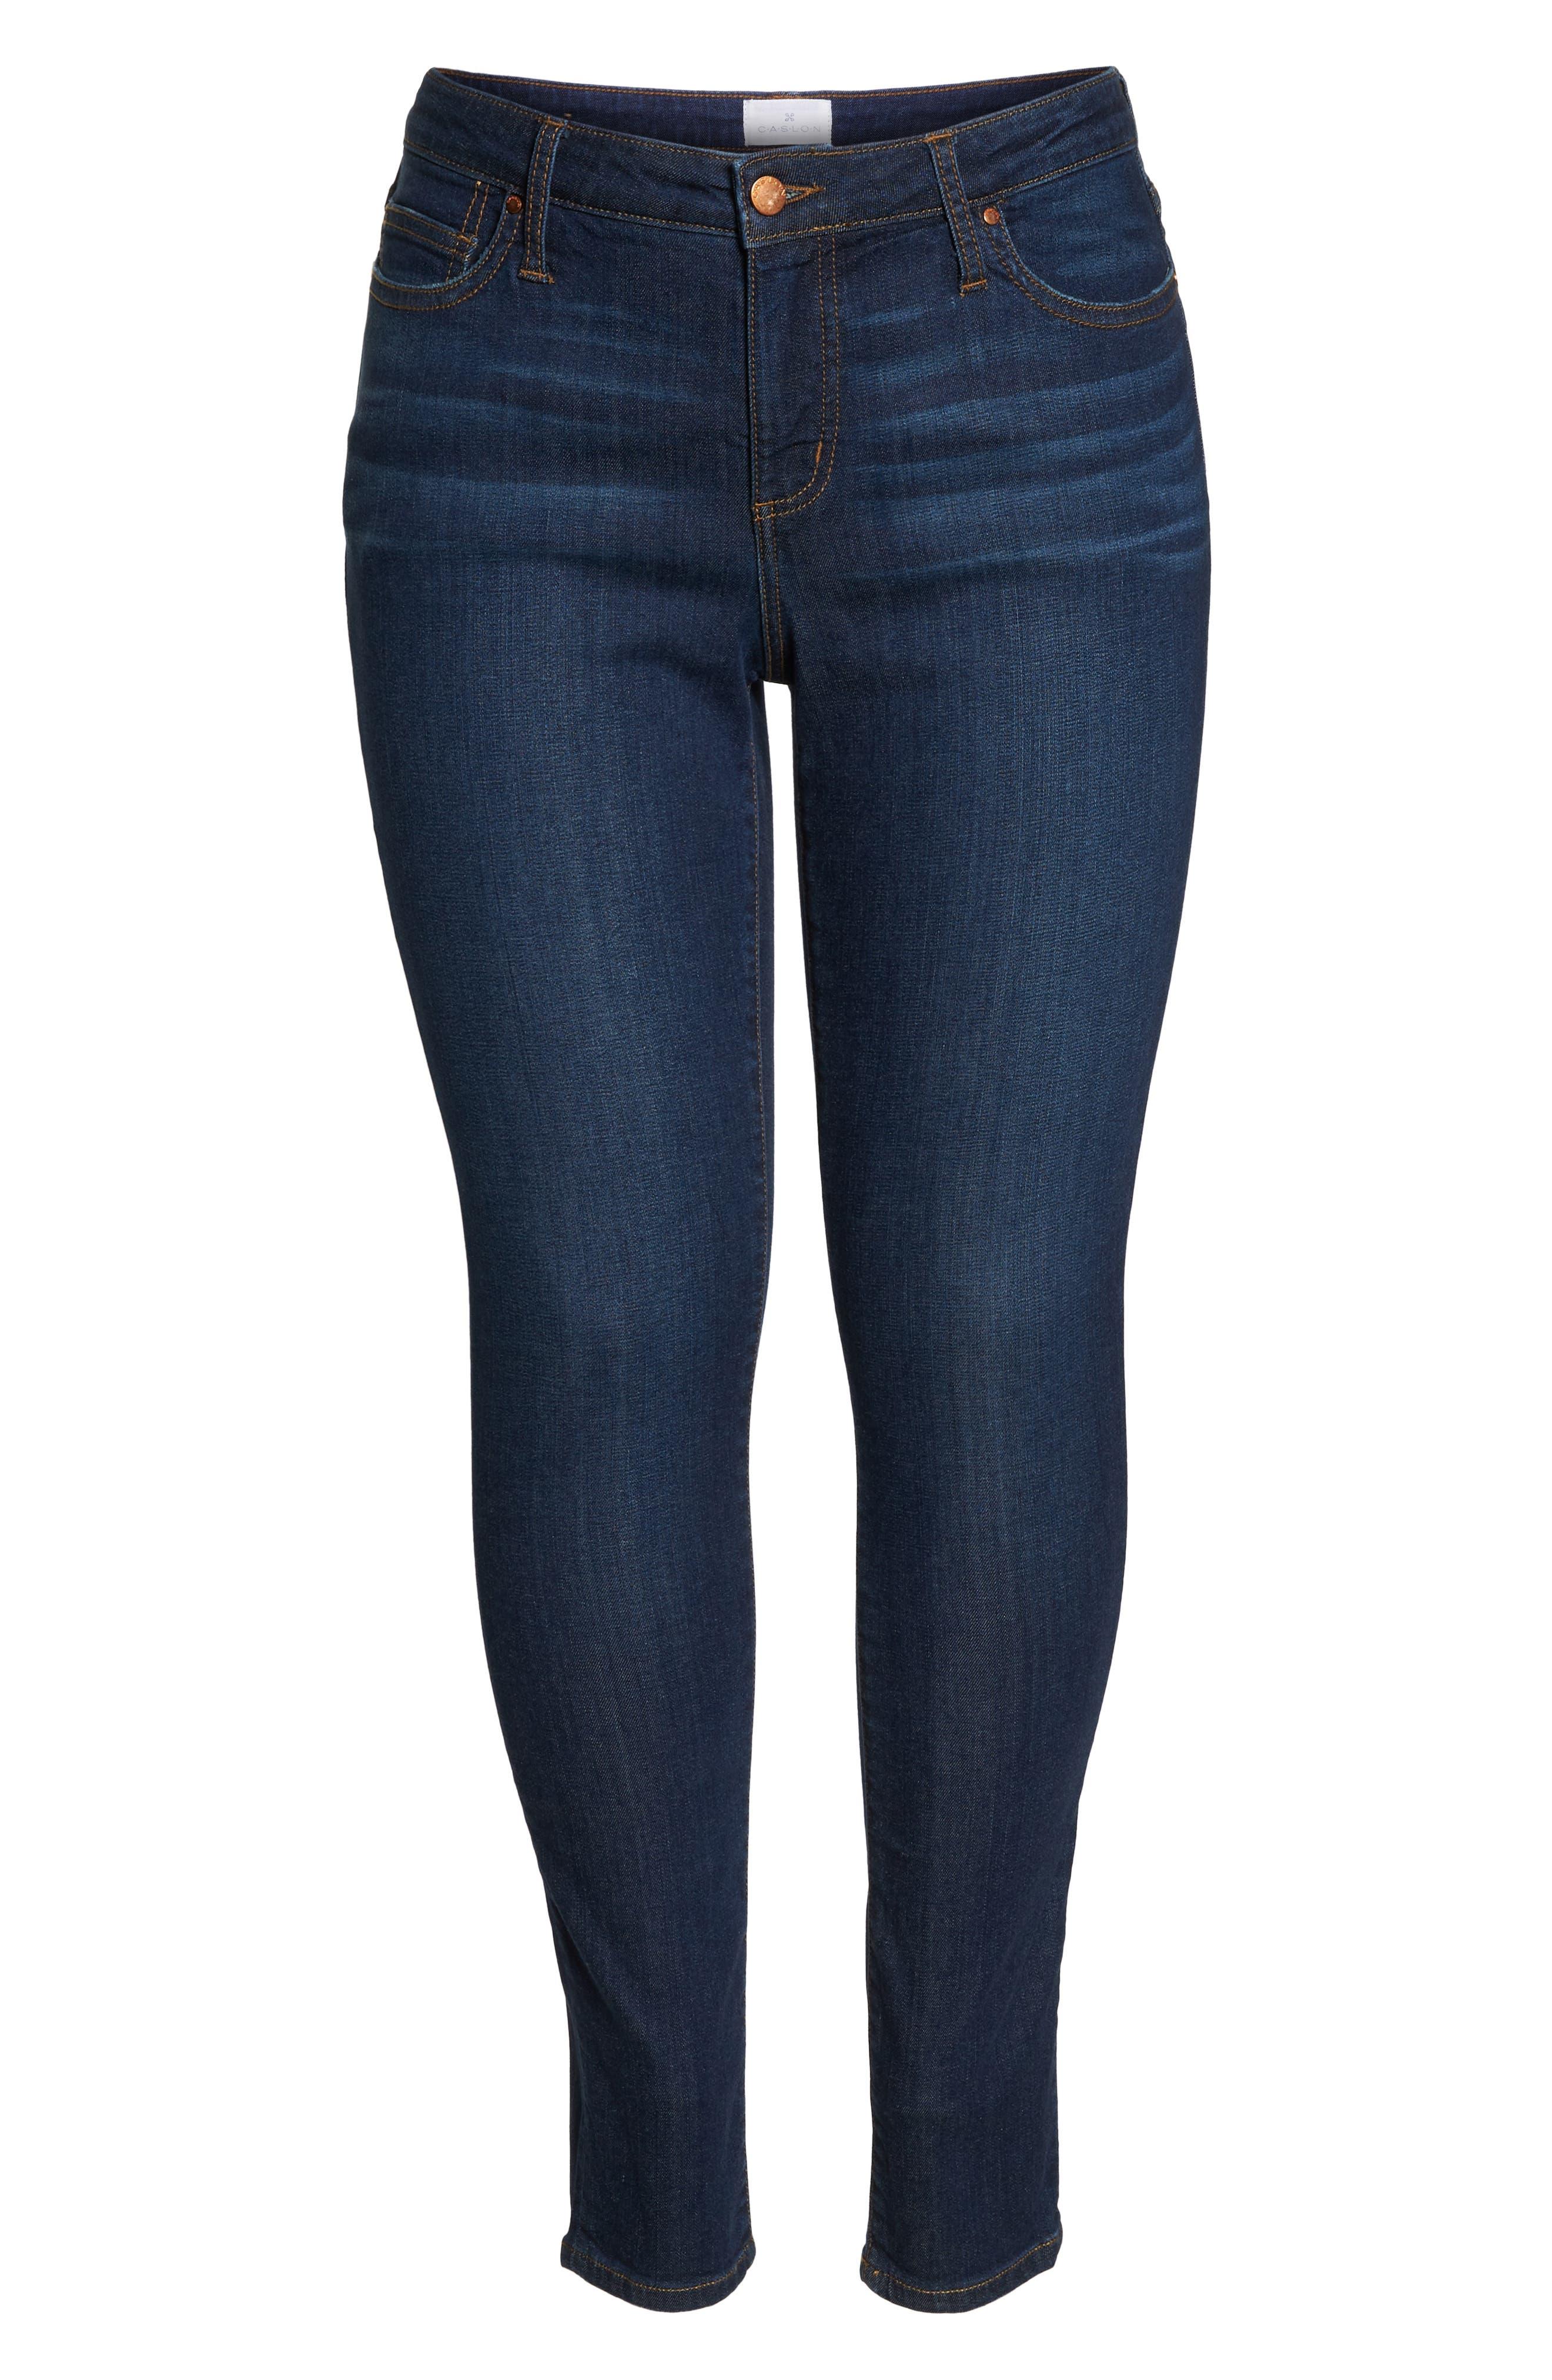 Stretch Skinny Jeans,                             Alternate thumbnail 7, color,                             MEDIUM WASH